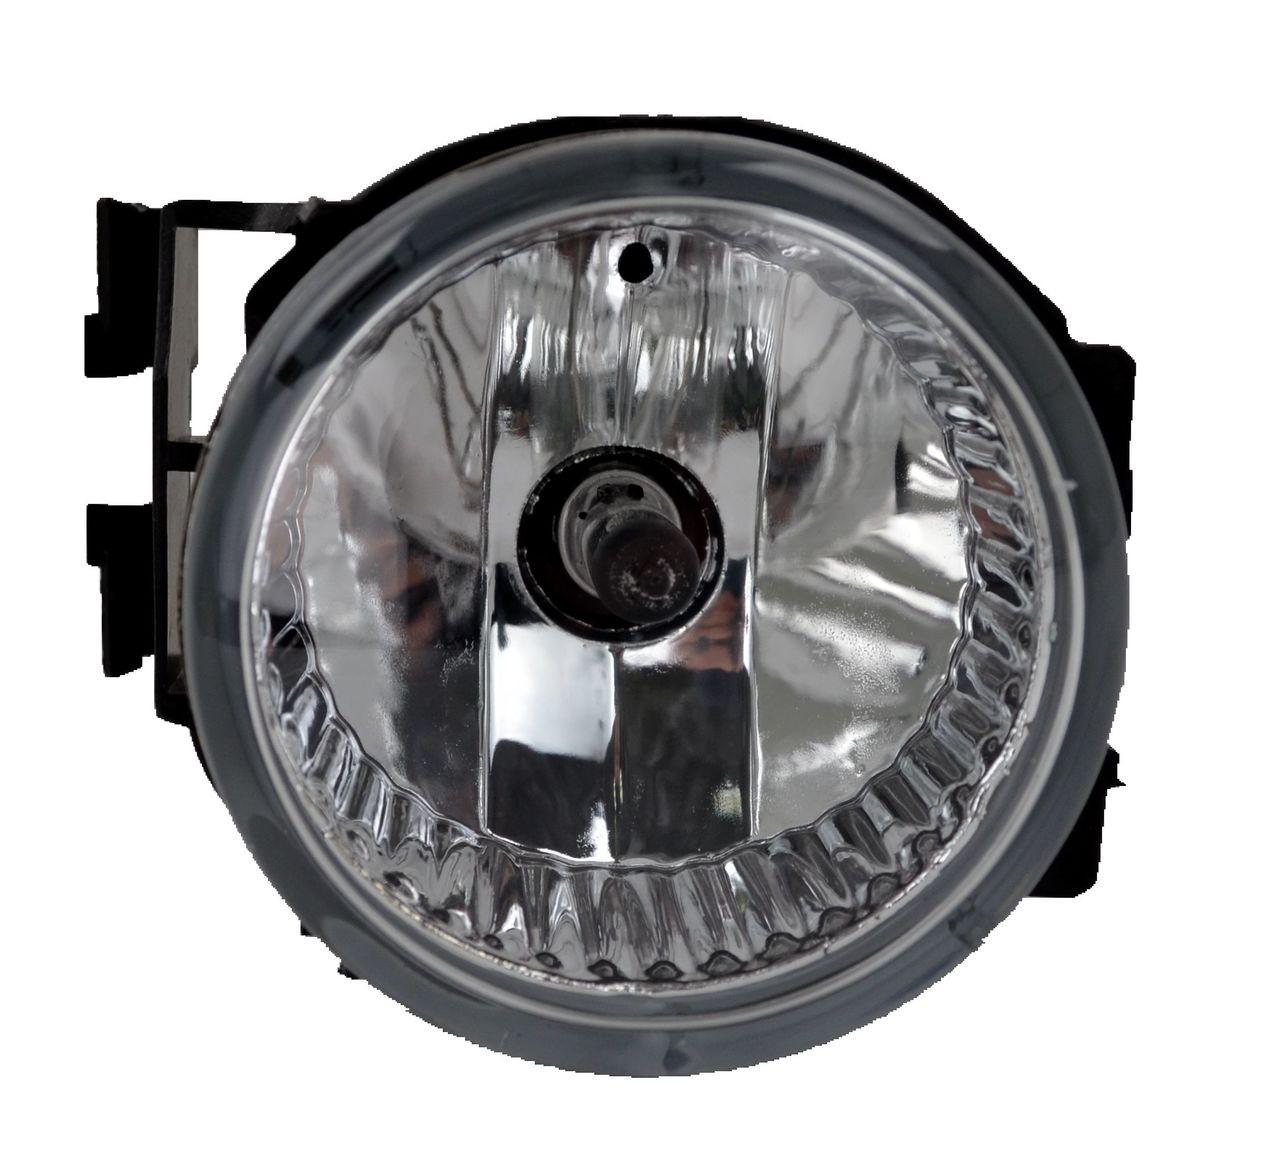 Fog Light Subaru Outback 05 2009 06 2012 New Right Rhs Spot Lamp 09 10 11 12